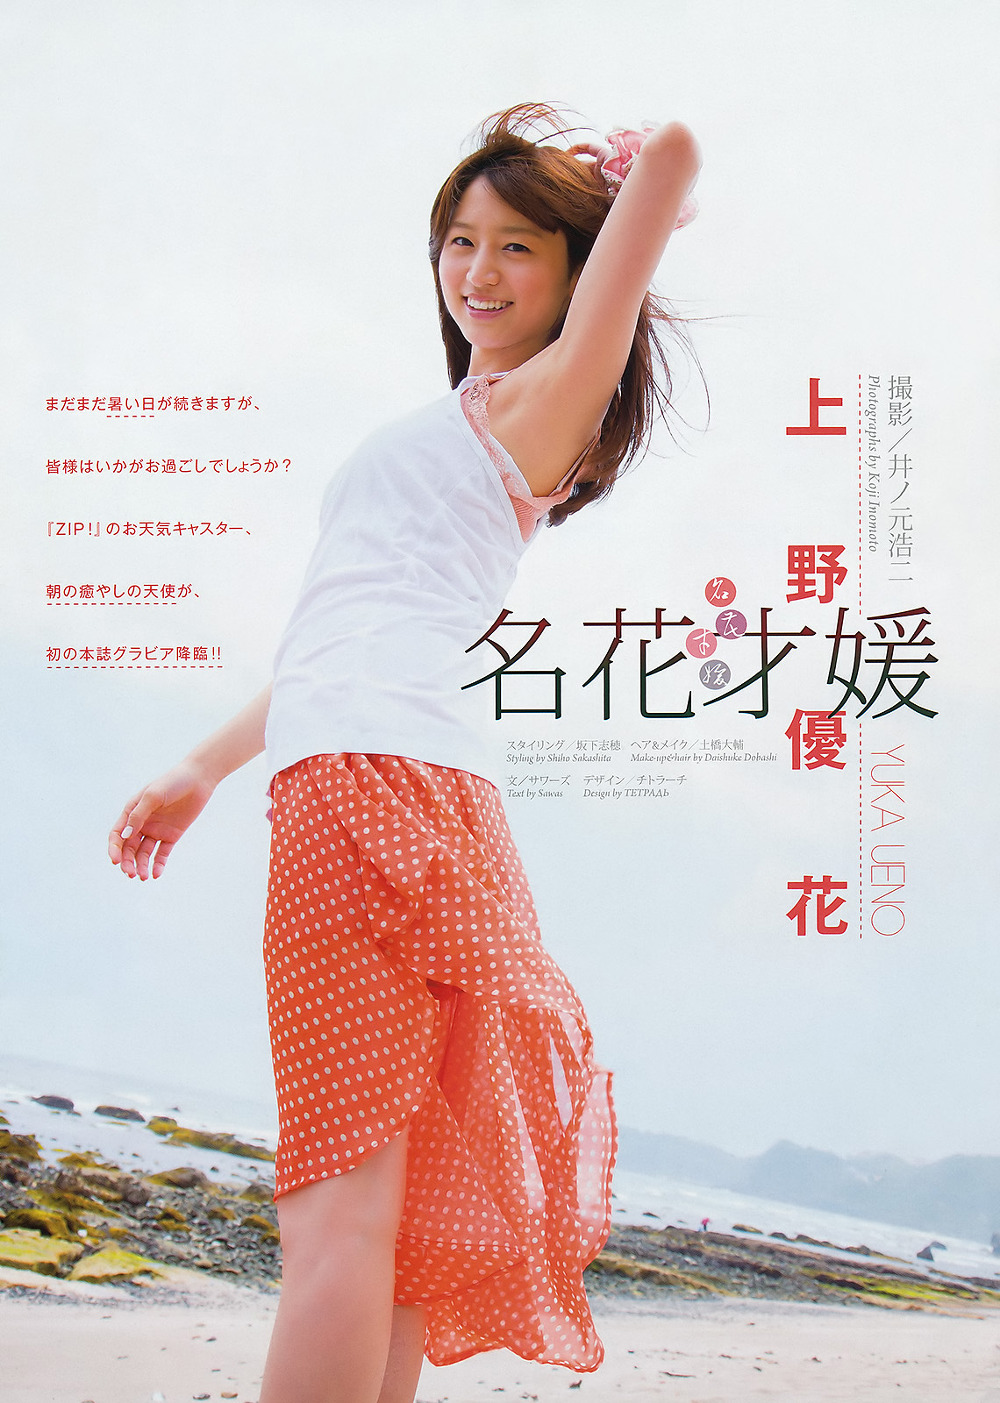 上野優花の画像 p1_6